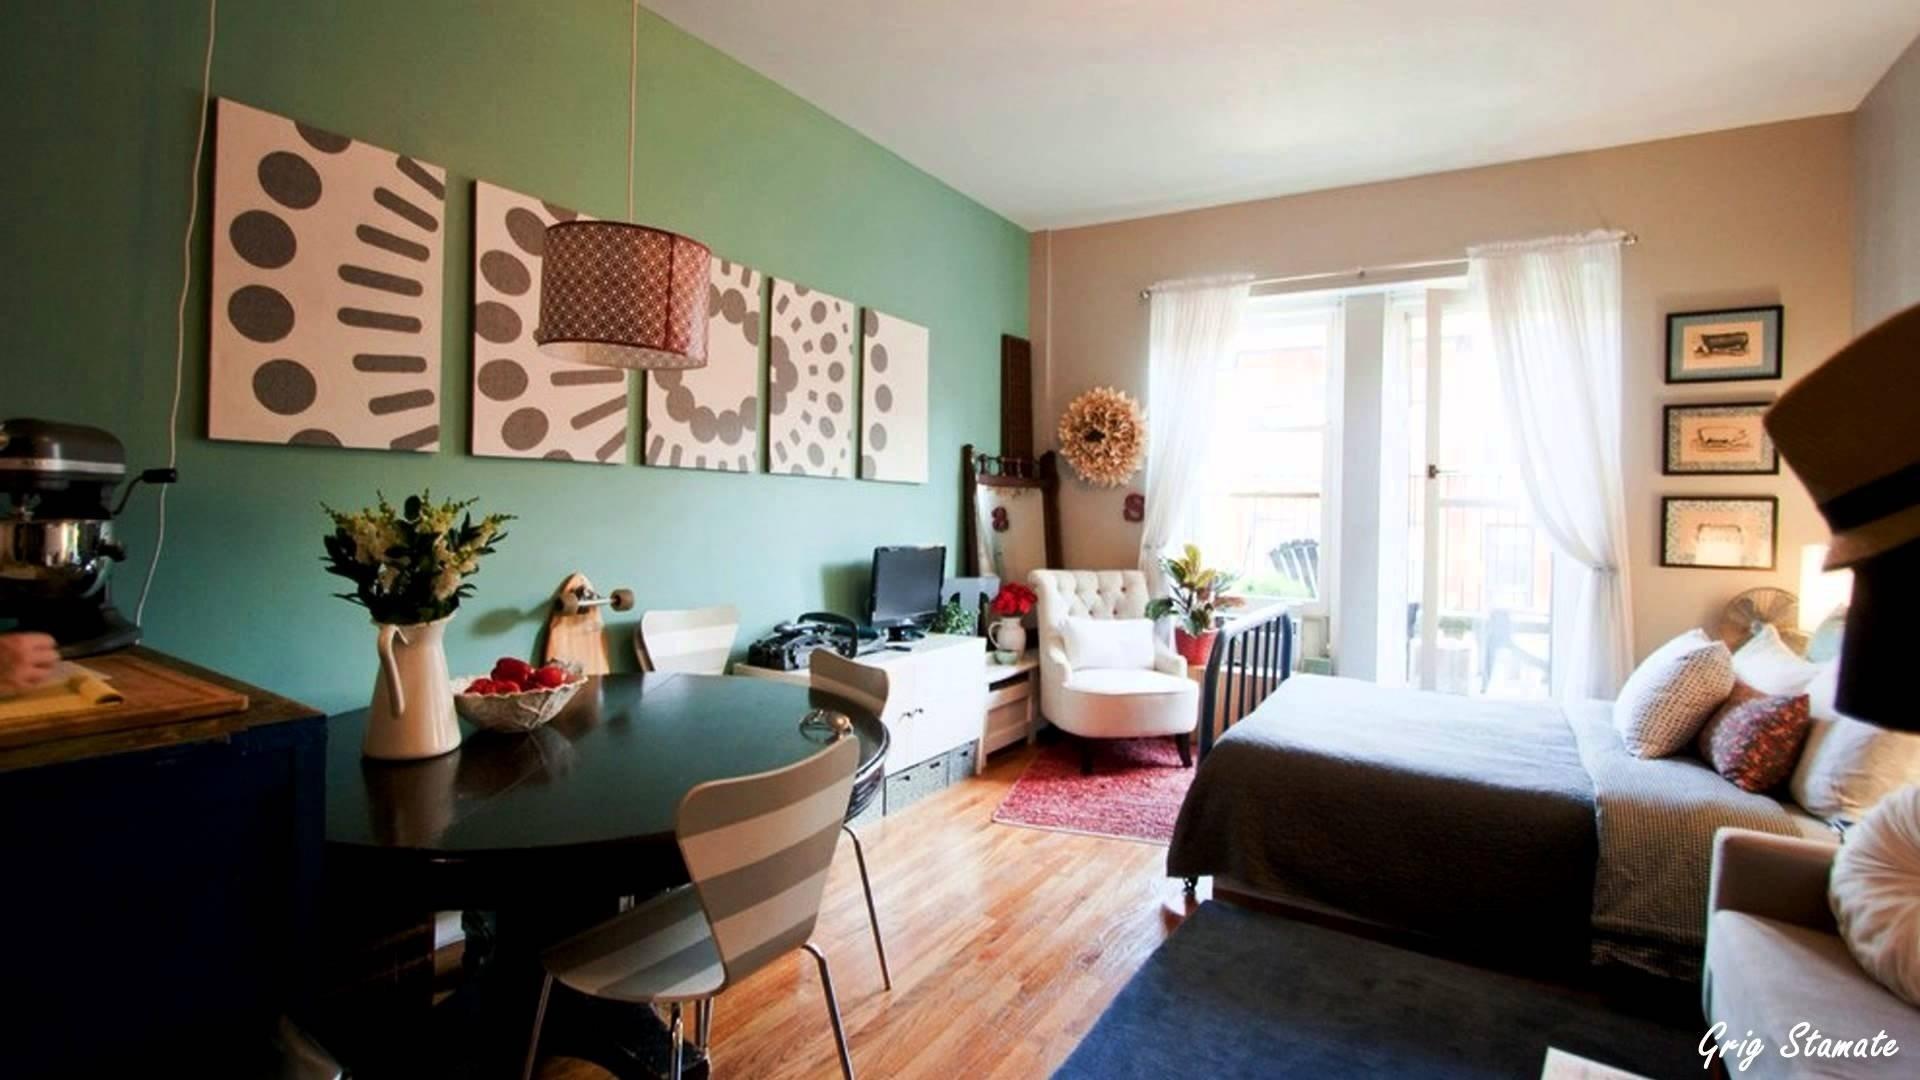 10 Pretty Decorating Ideas For Studio Apartments studio apartment decorating on a budget youtube 2020